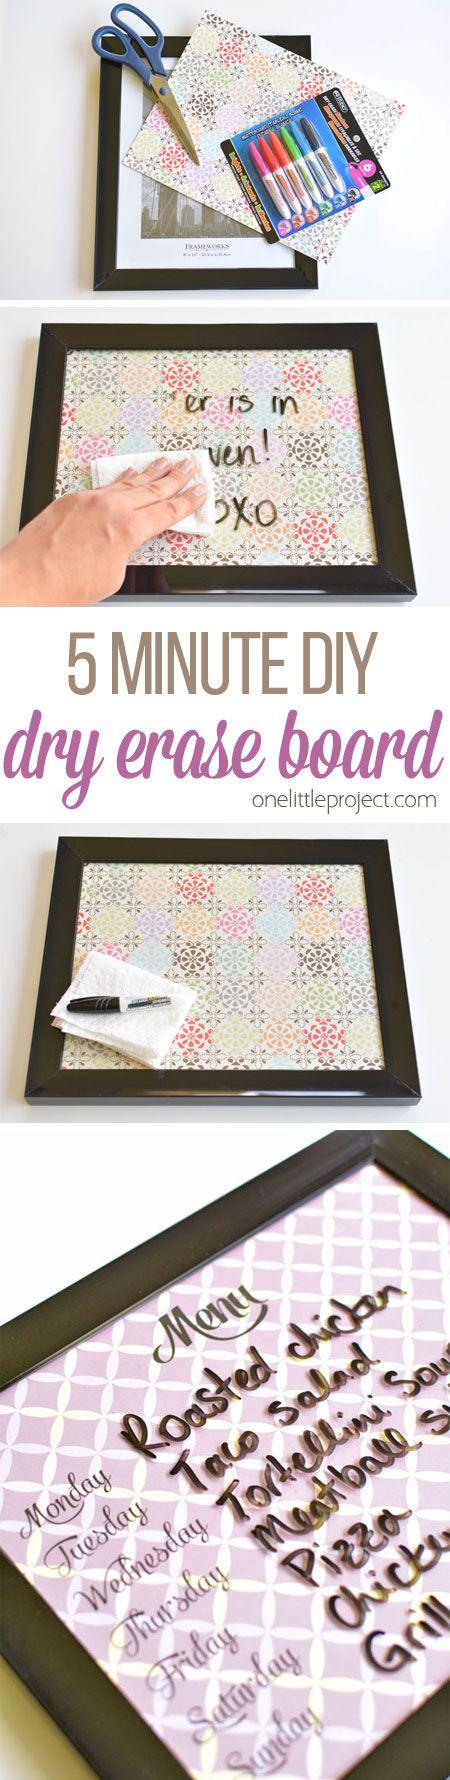 5 minute dry erase board diy pinterest bricolaje manualidades y bricolaje f cil - Manualidades y bricolaje ...